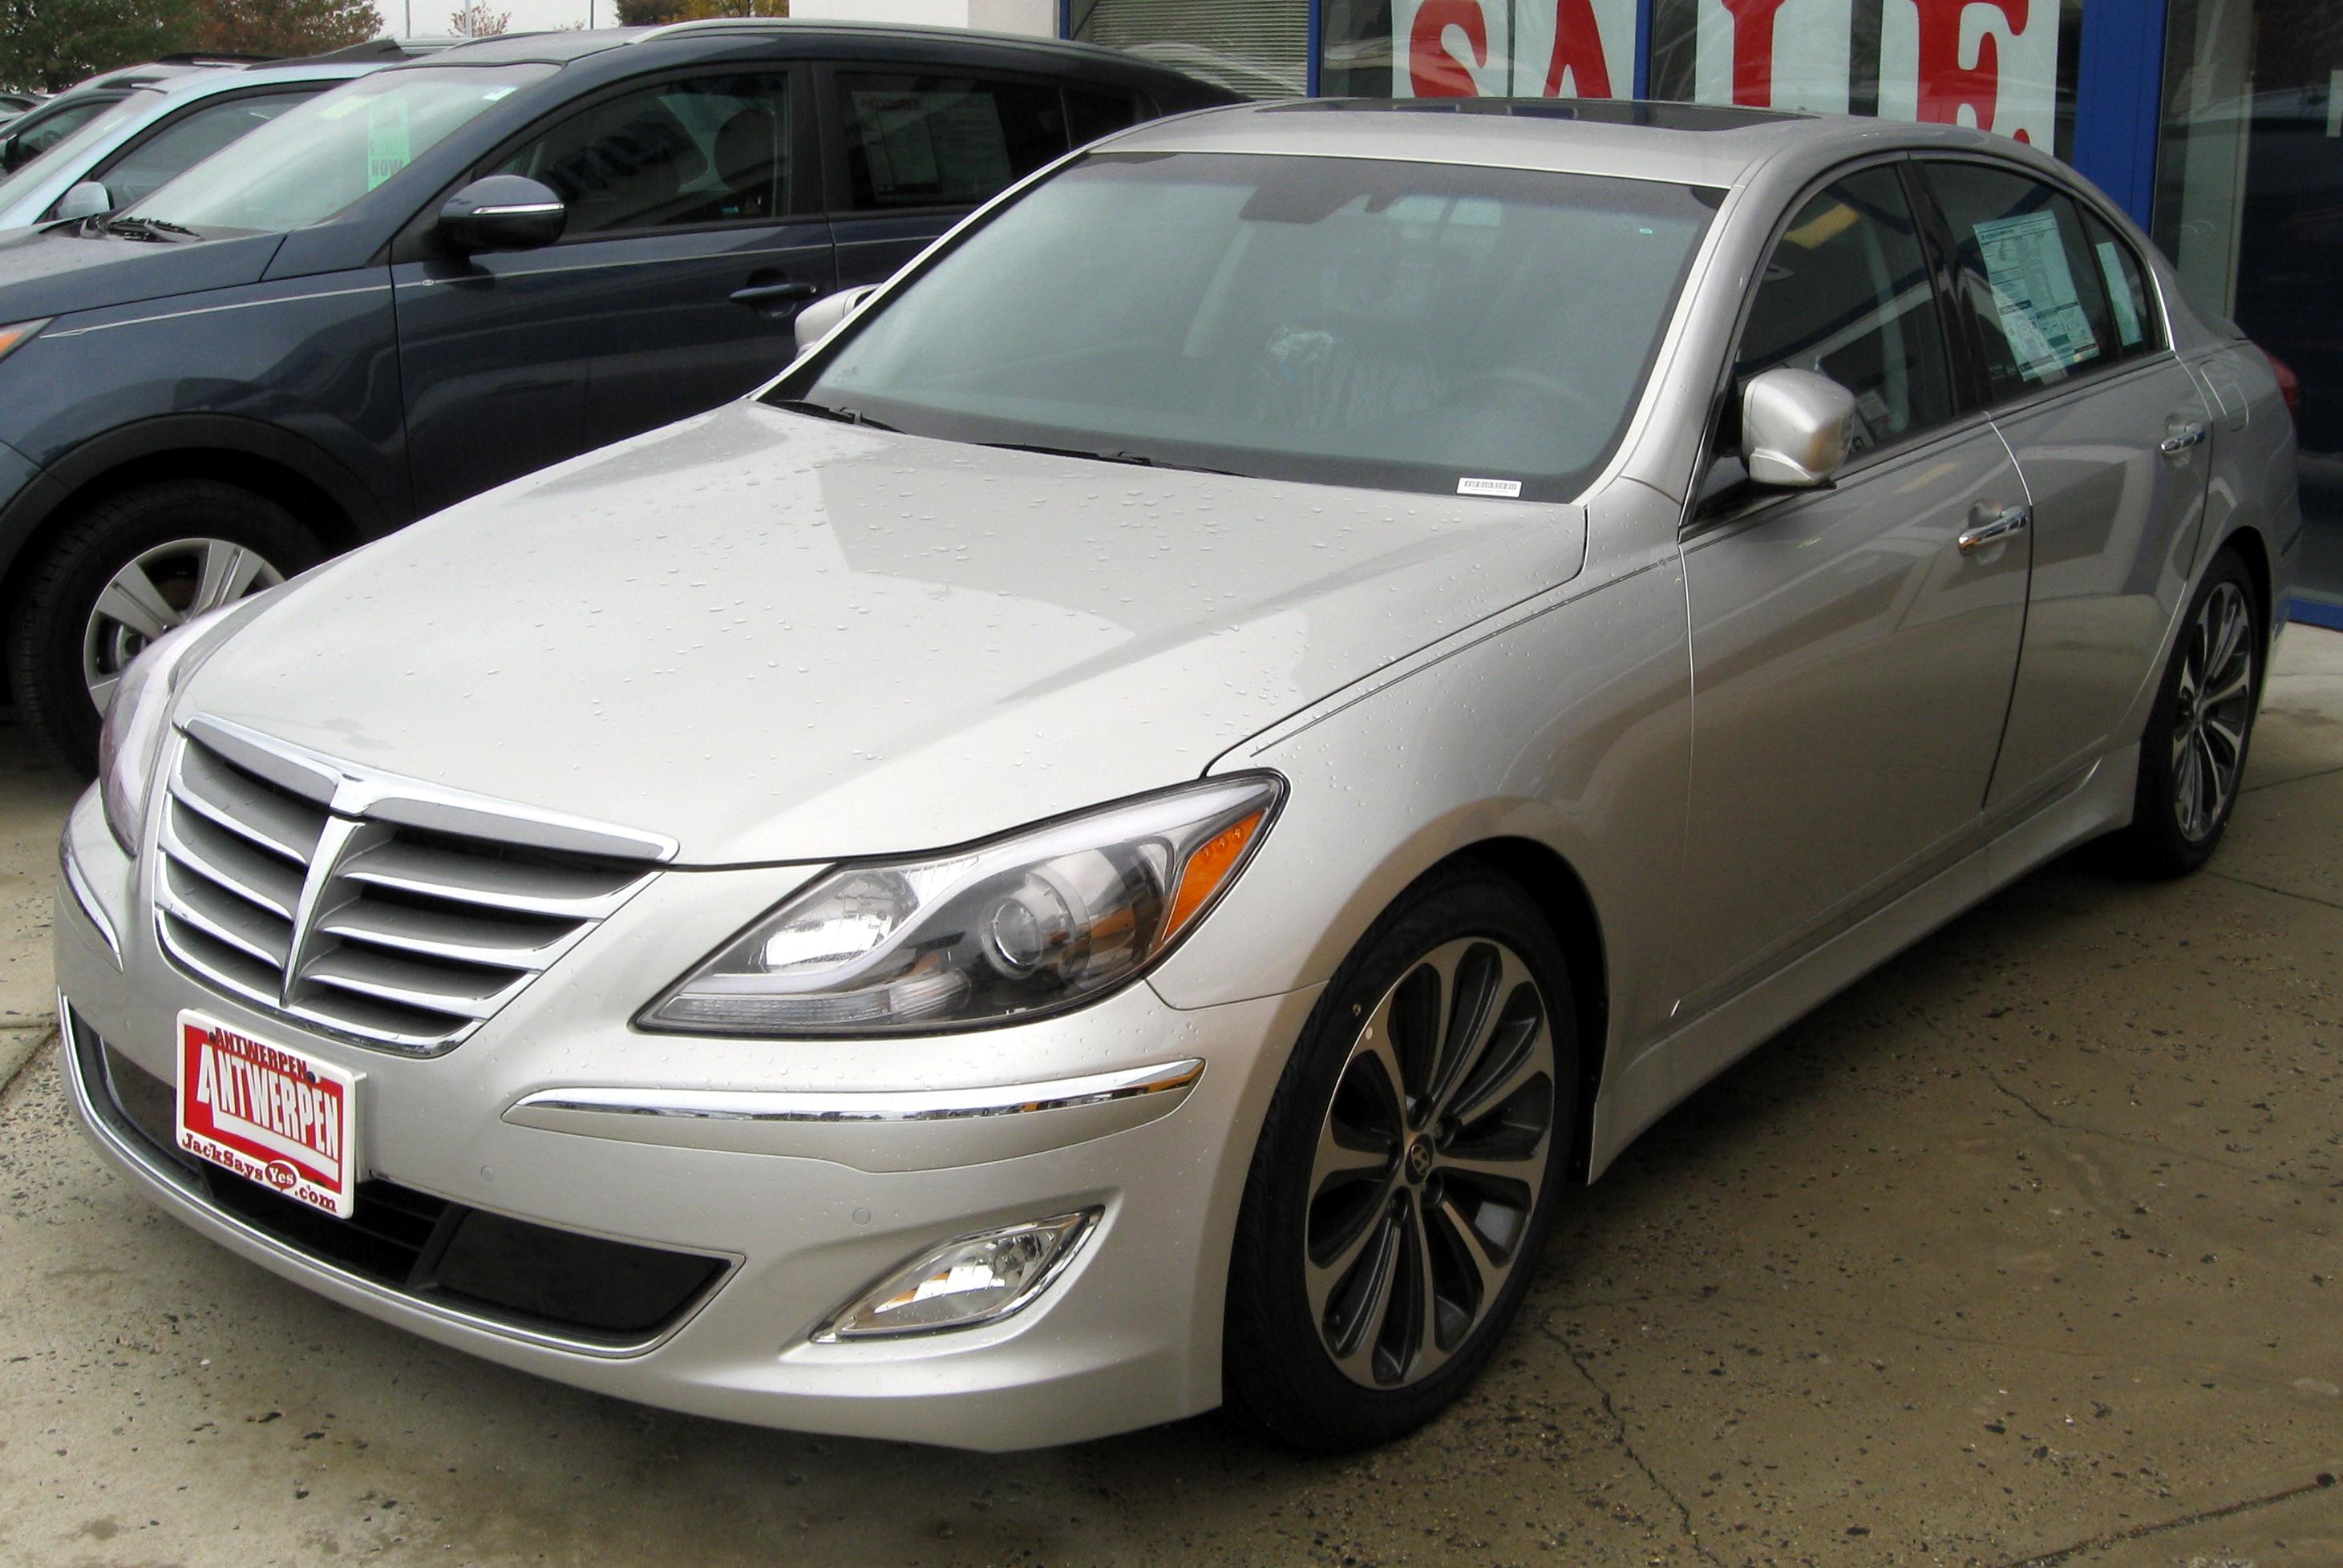 File:2012 Hyundai Genesis R Spec    10 19 2011.